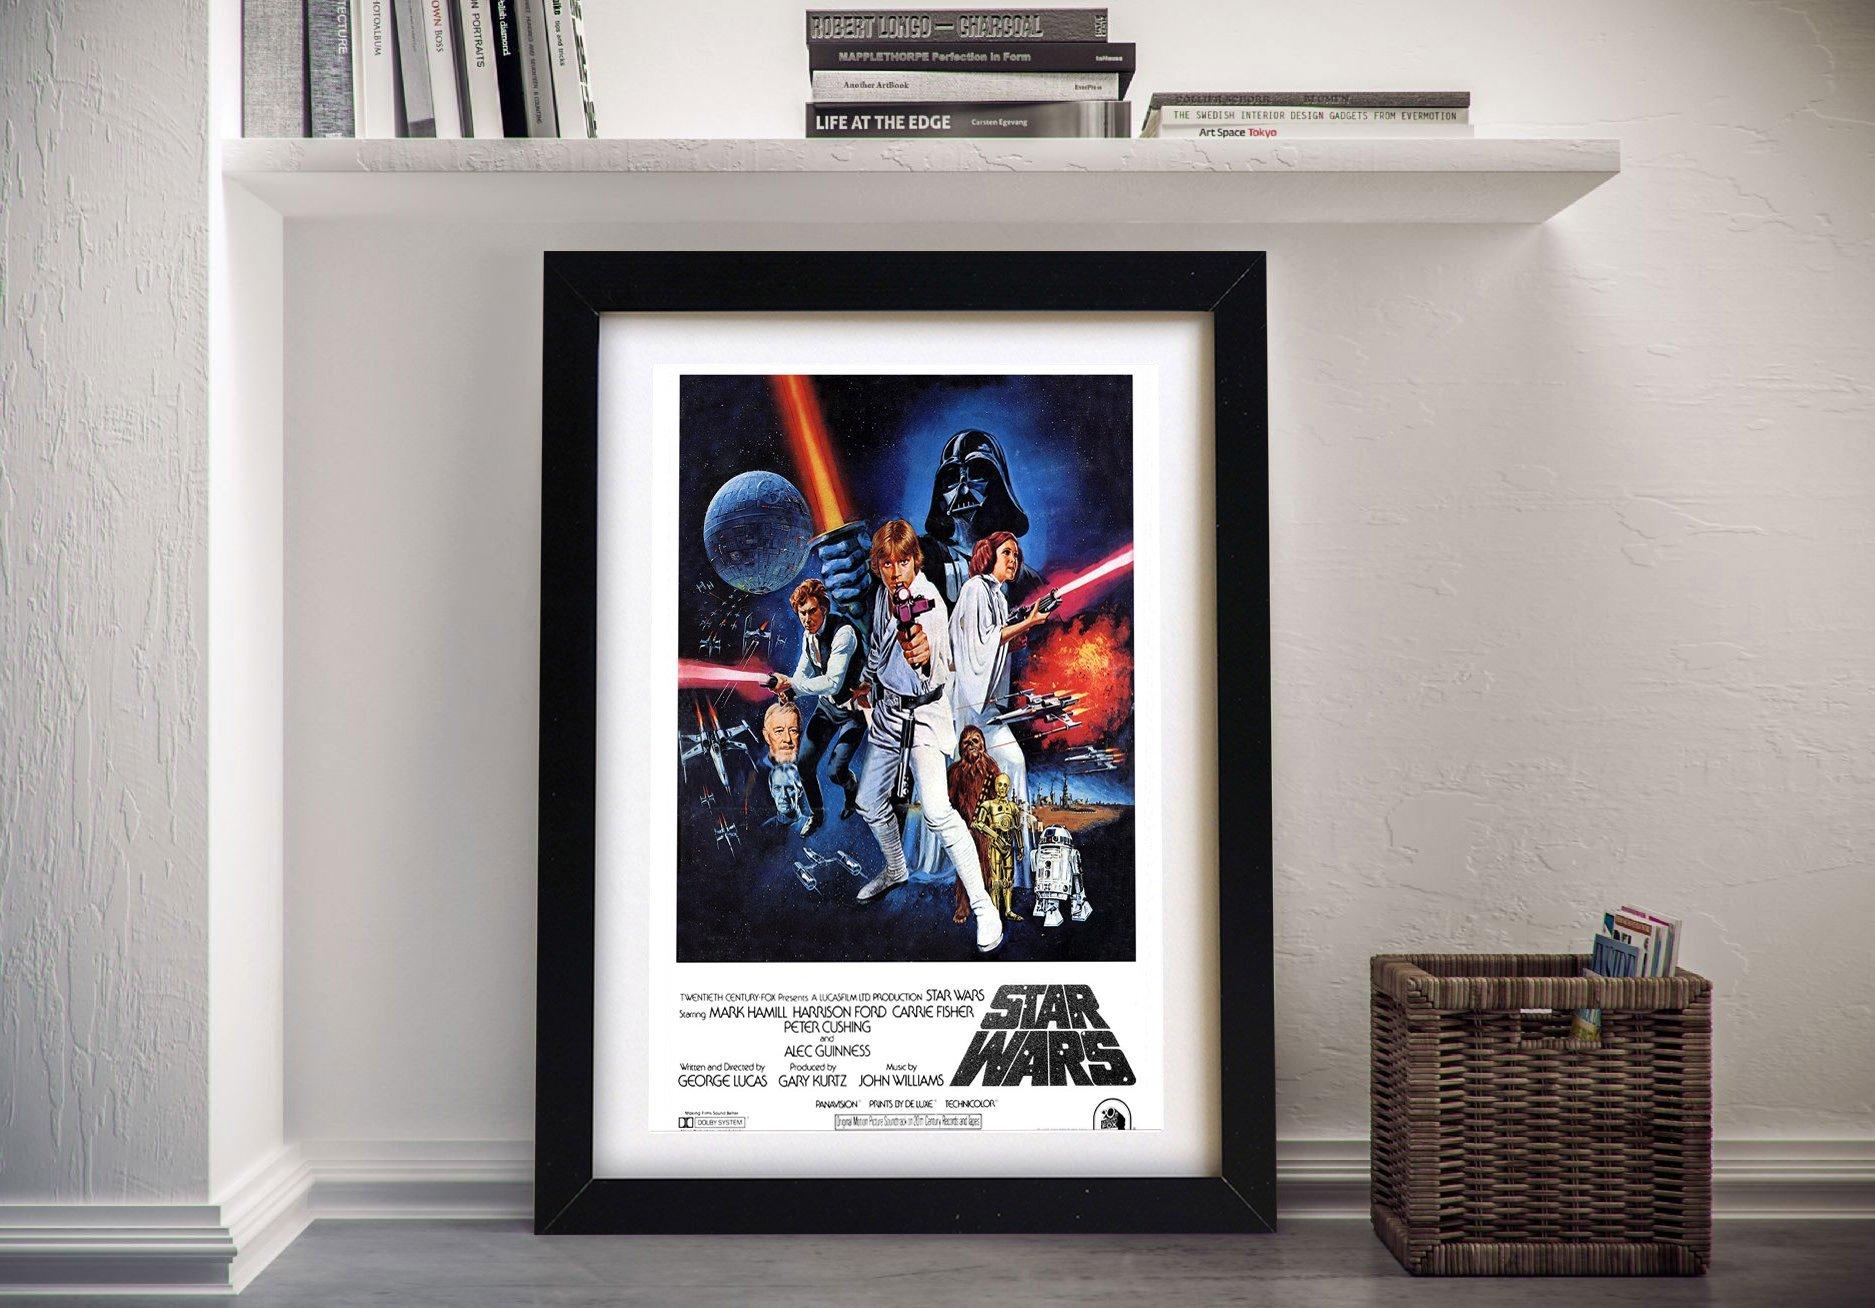 Star Wars New Hope Movie Poster Framed Artwork